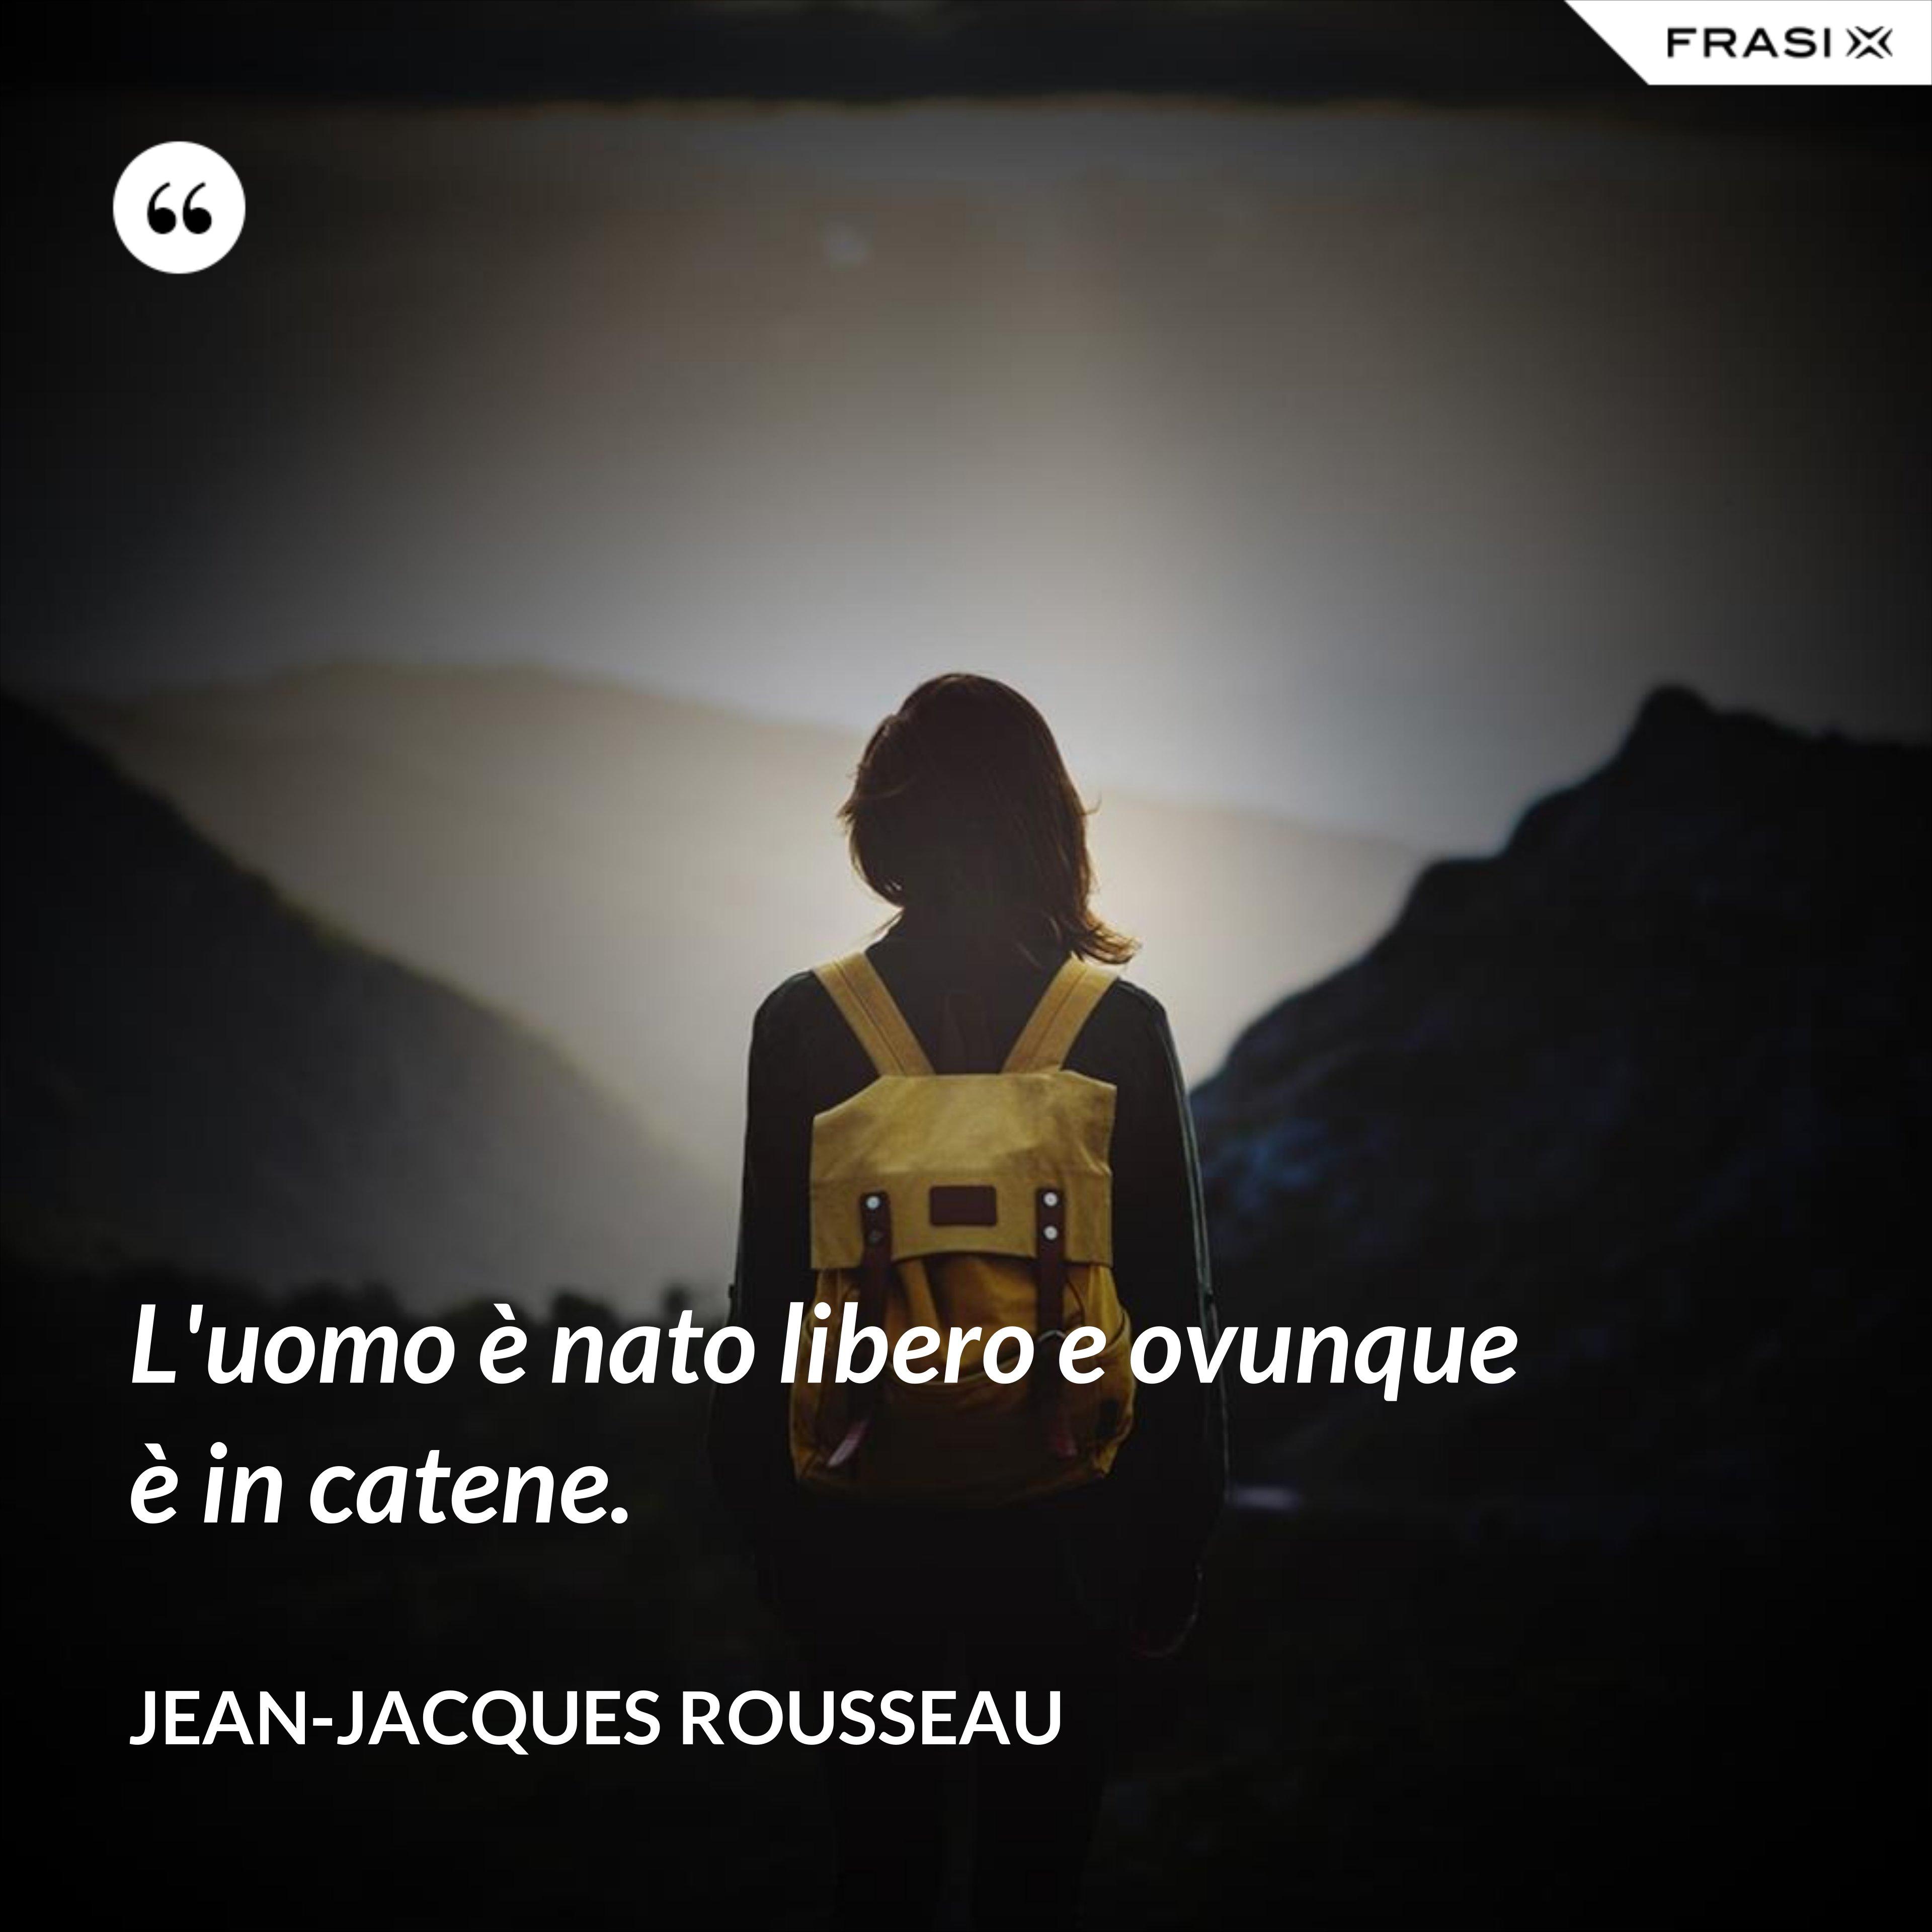 L'uomo è nato libero e ovunque è in catene. - Jean-Jacques Rousseau